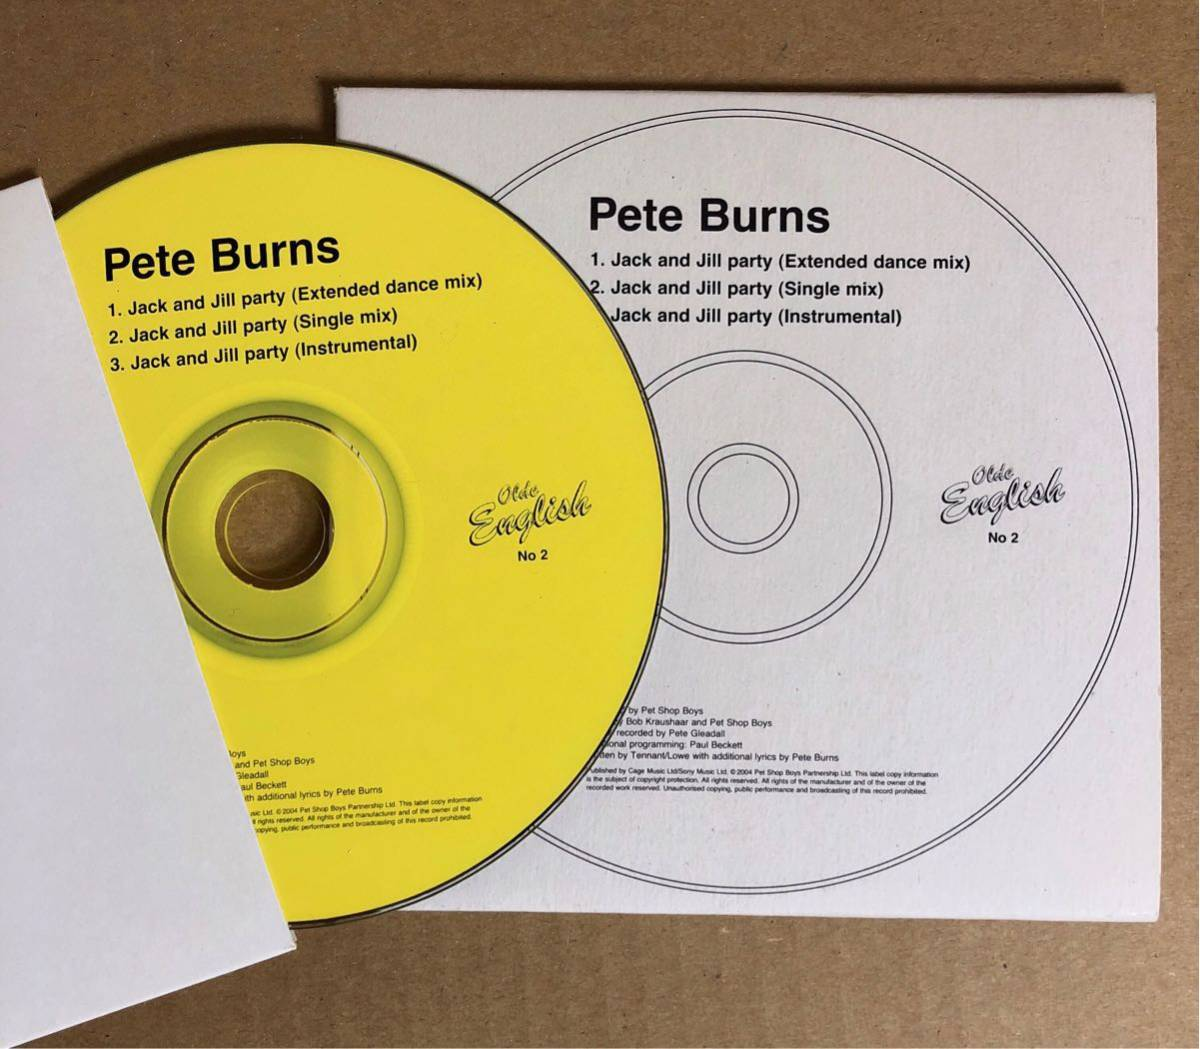 UK盤CDシングル Pete Burns (Dead Or Alive) JACK AND JILL PARTY (Pet Shop Boysプロデュース) ピート・バーンズ デッド・オア・アライヴ_画像2